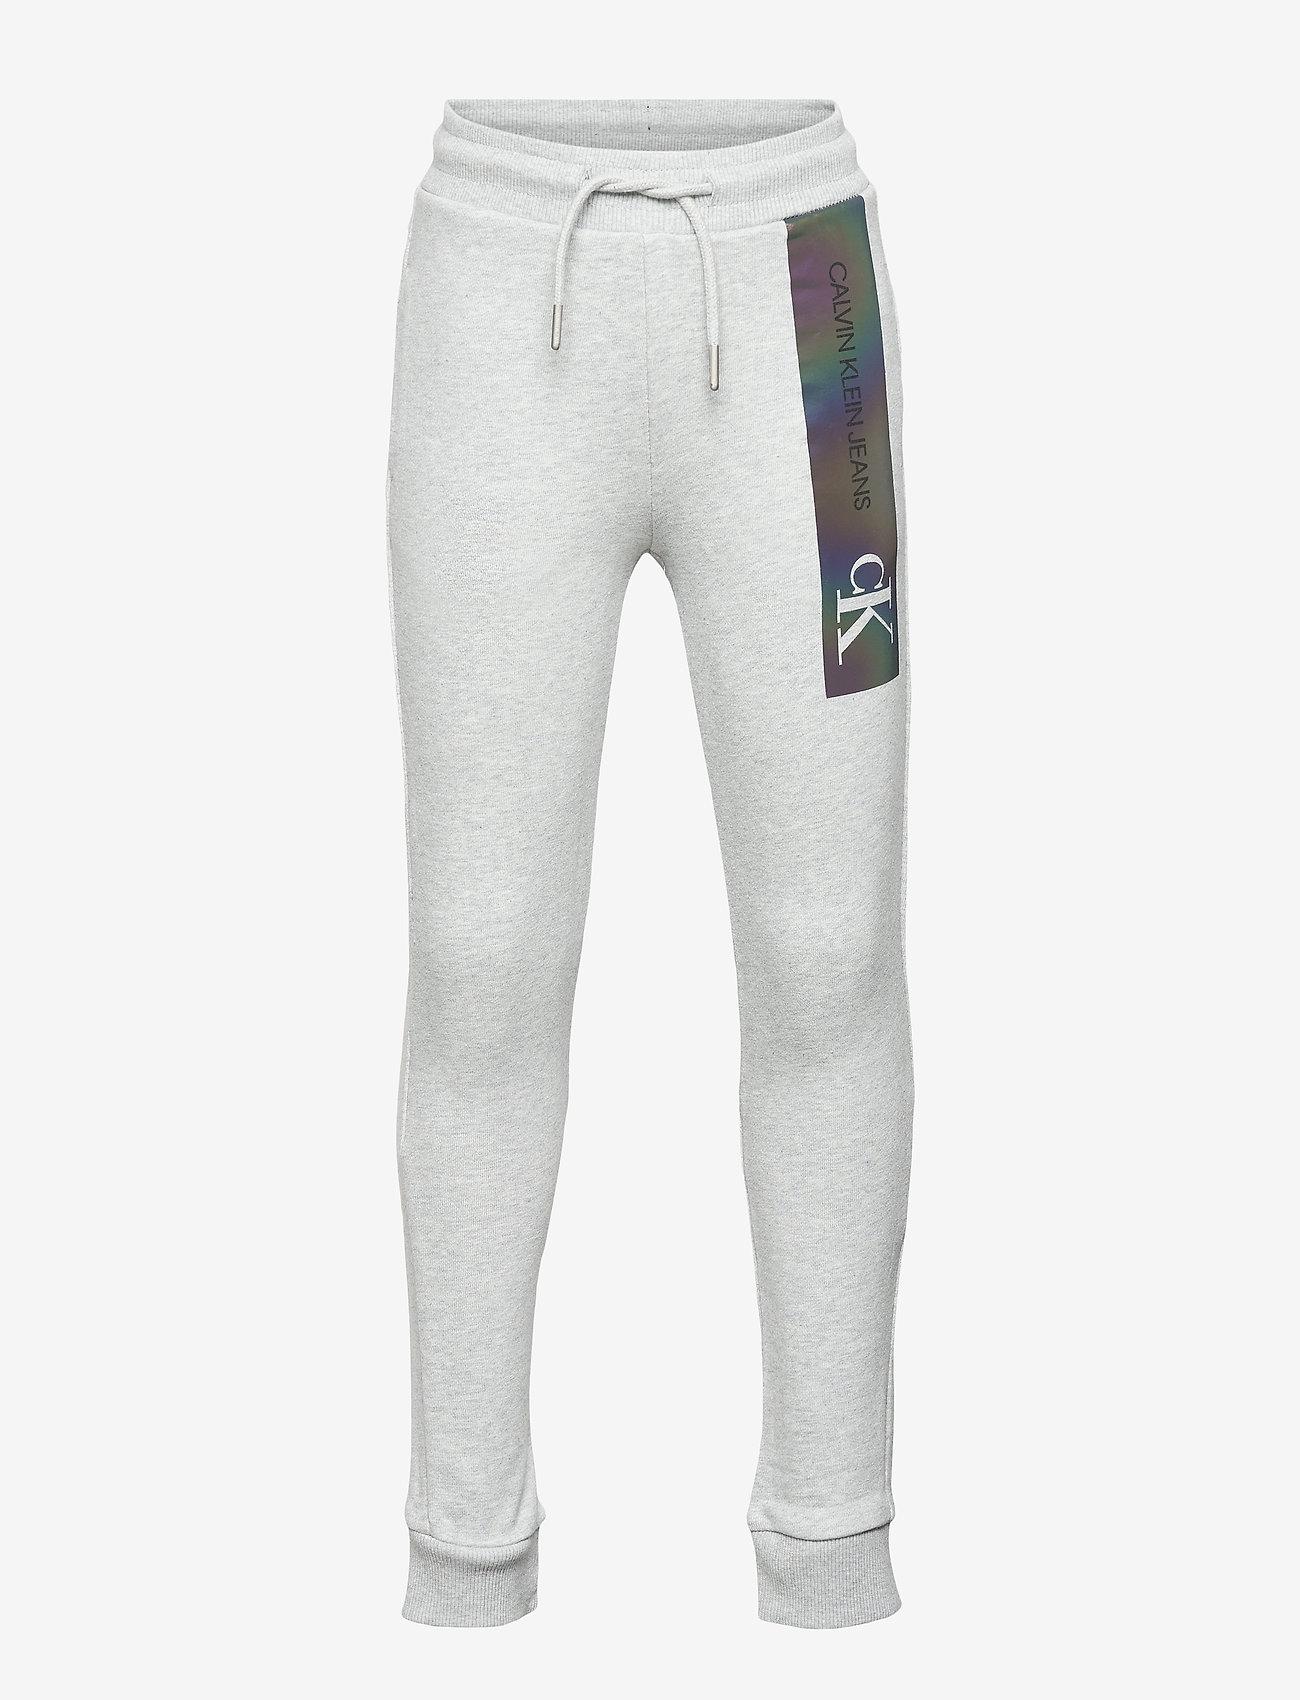 Calvin Klein - REFLECTIVE LOGO SLIM FIT PANTS - jogginghosen - light grey heather - 0